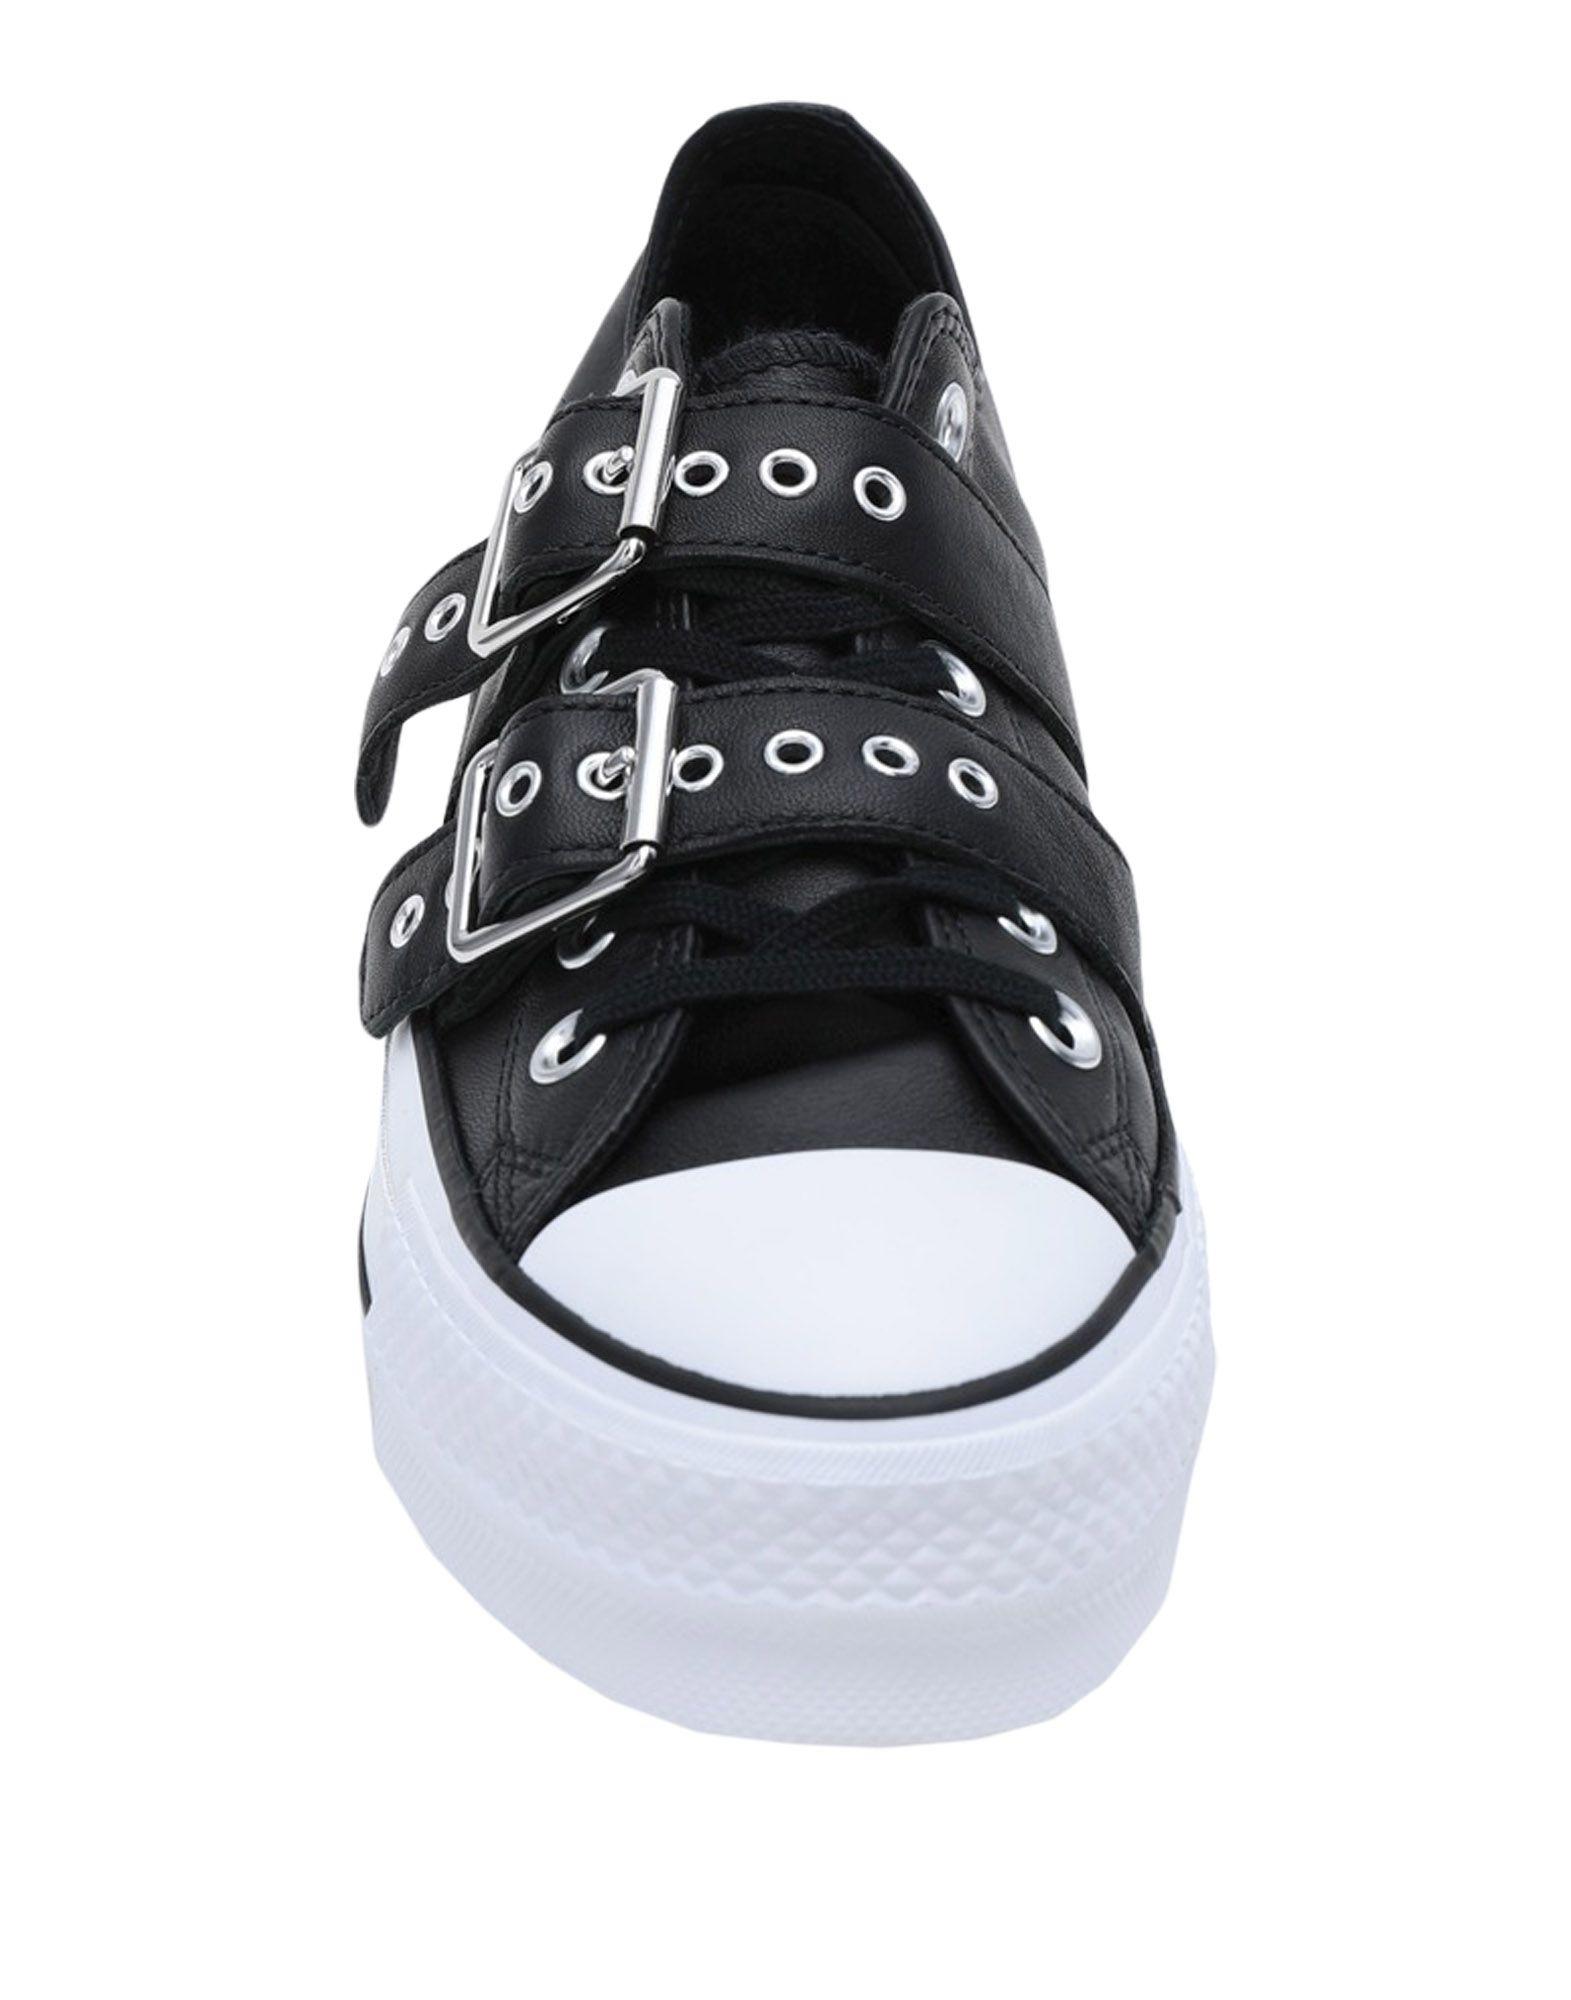 Converse All All All Star Ctas Lift Buckle - Sneakers - Women Converse All Star Sneakers online on  United Kingdom - 11551420AU 71dc58